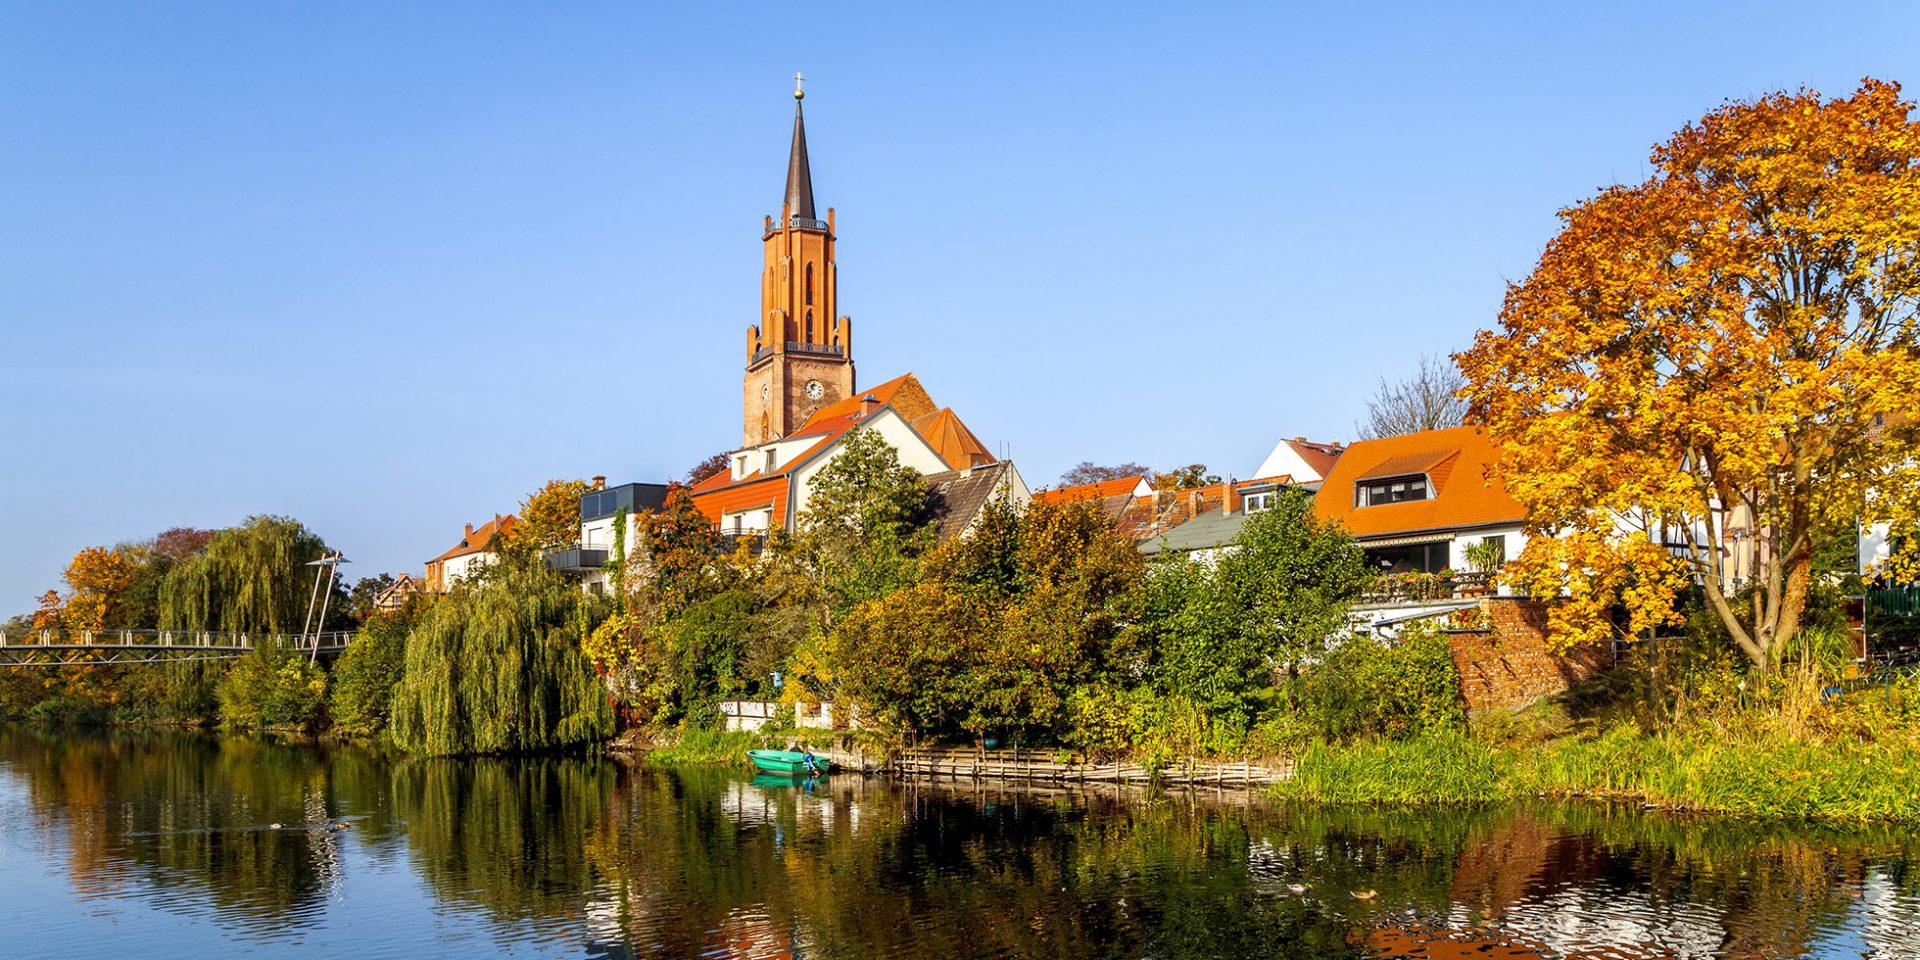 Rathenow (Havellandklinik)